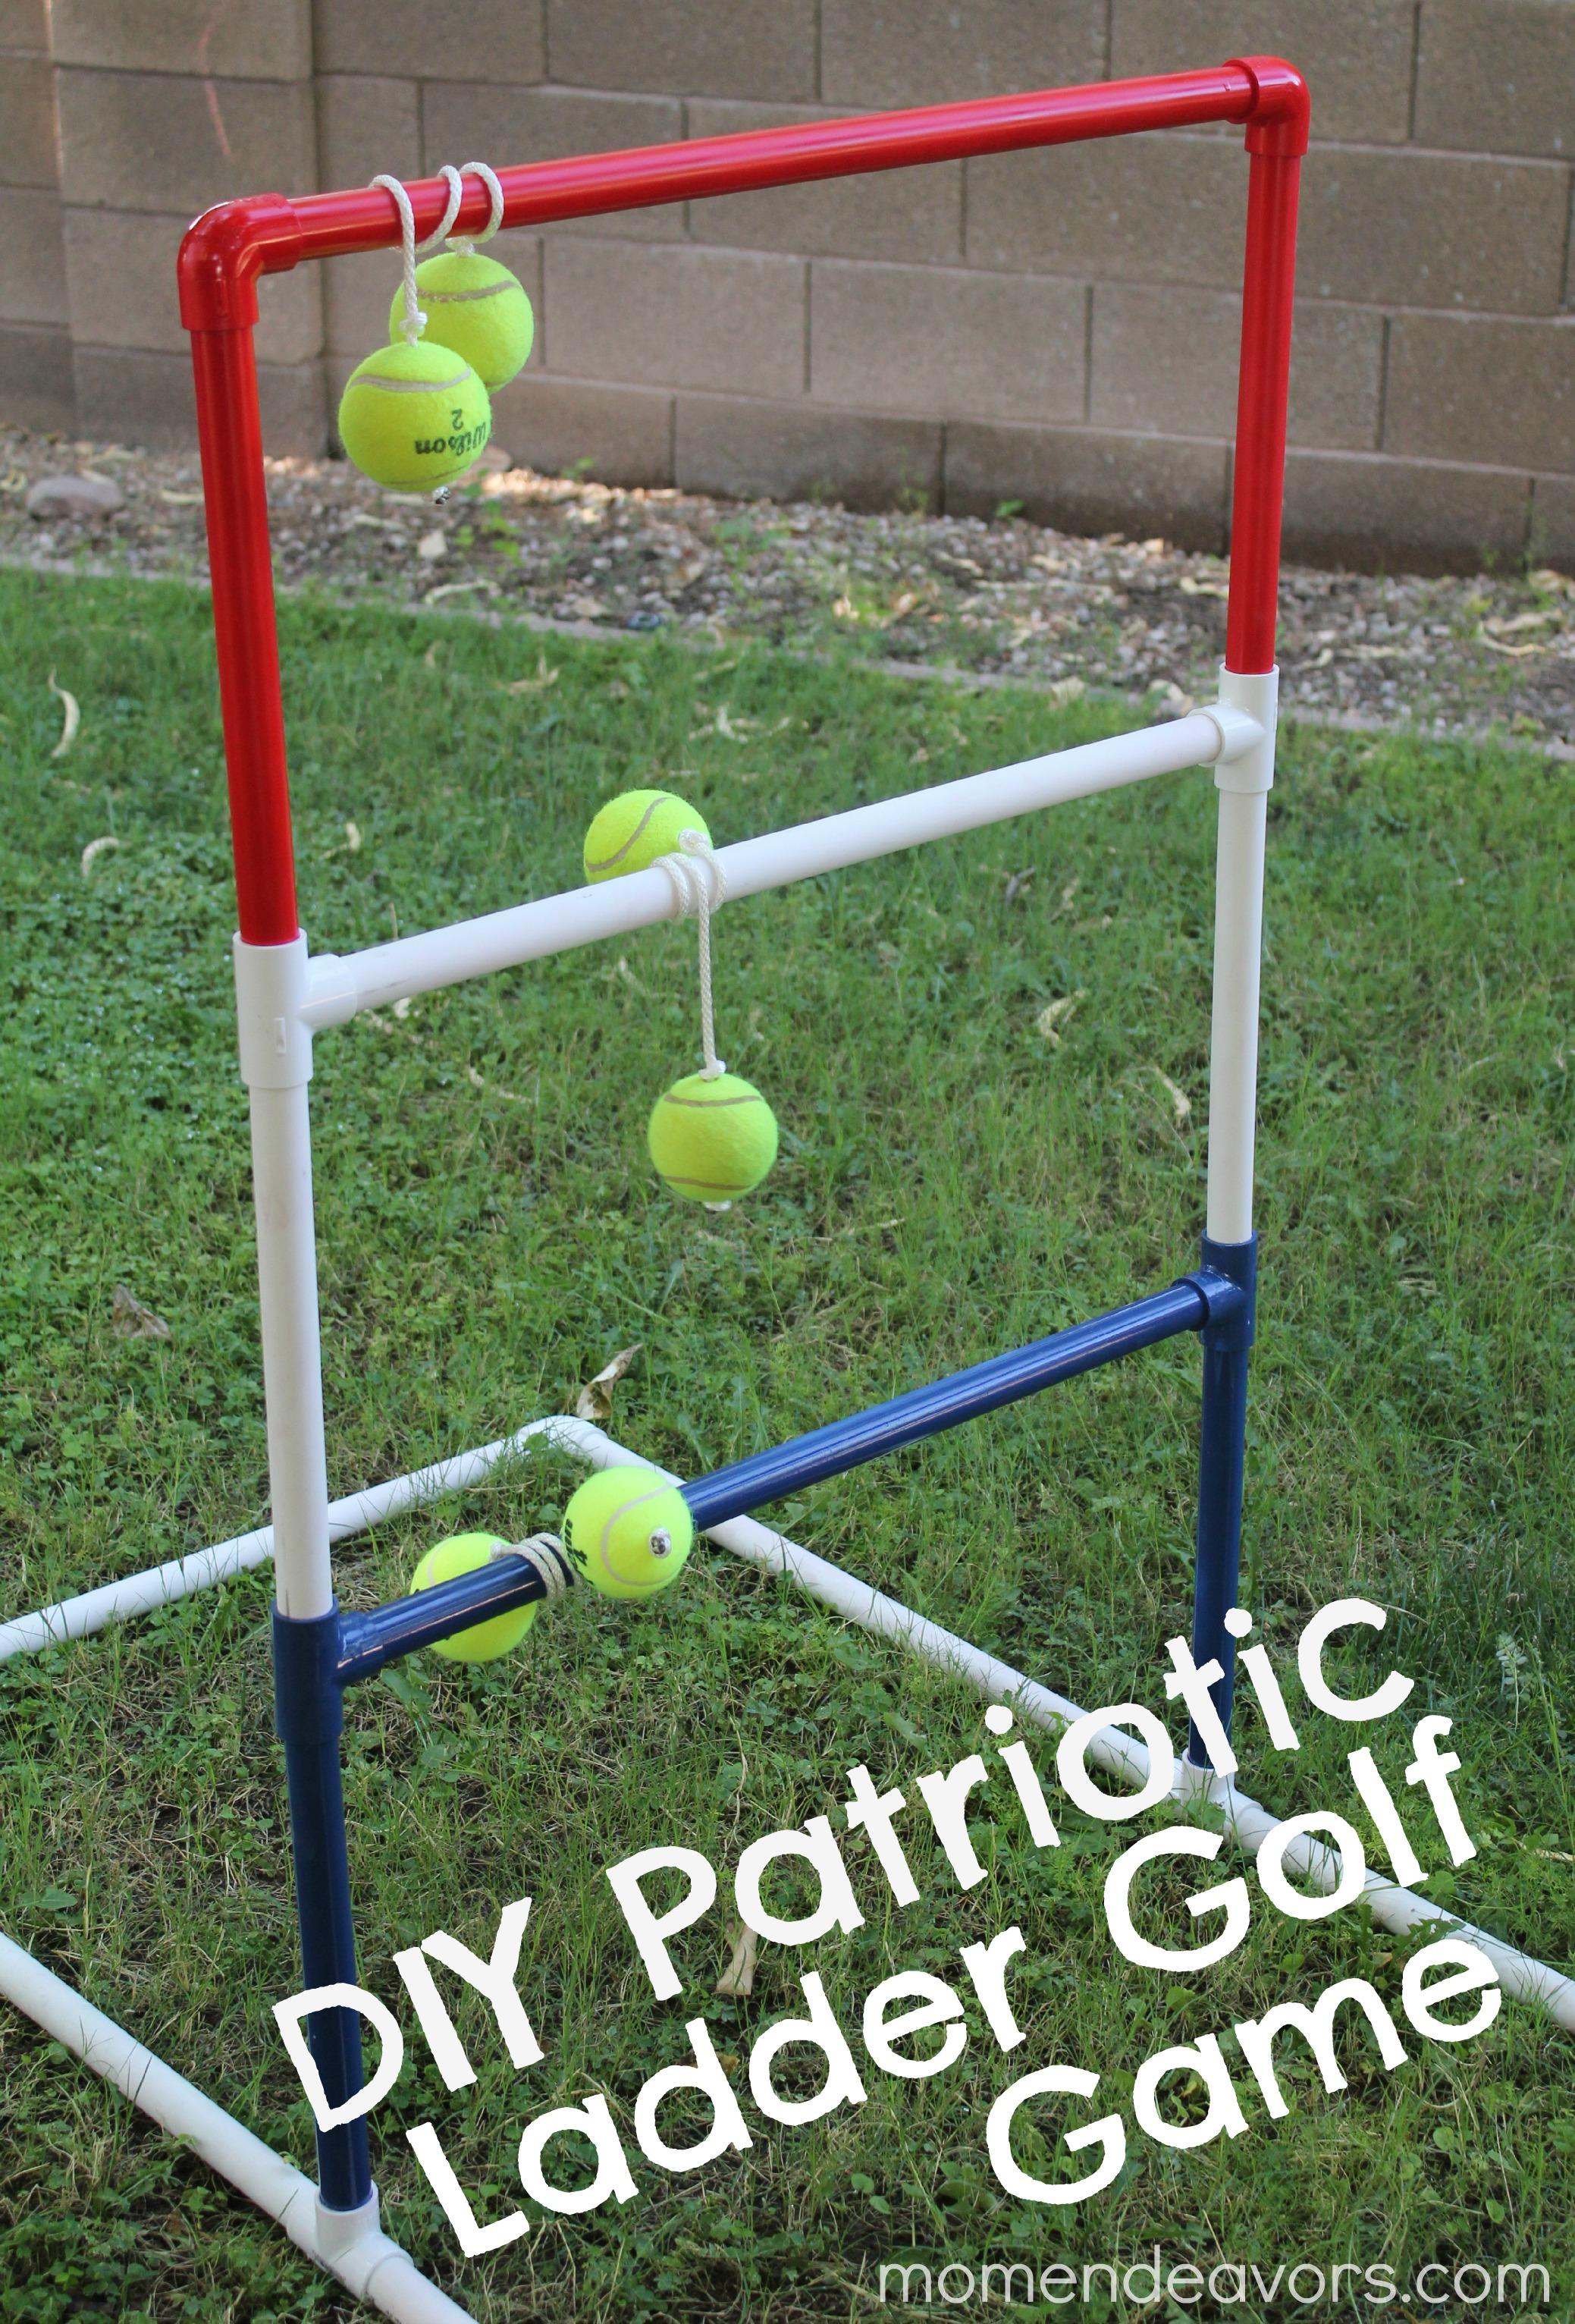 Diy Patriotic Ladder Golf Mom Endeavors